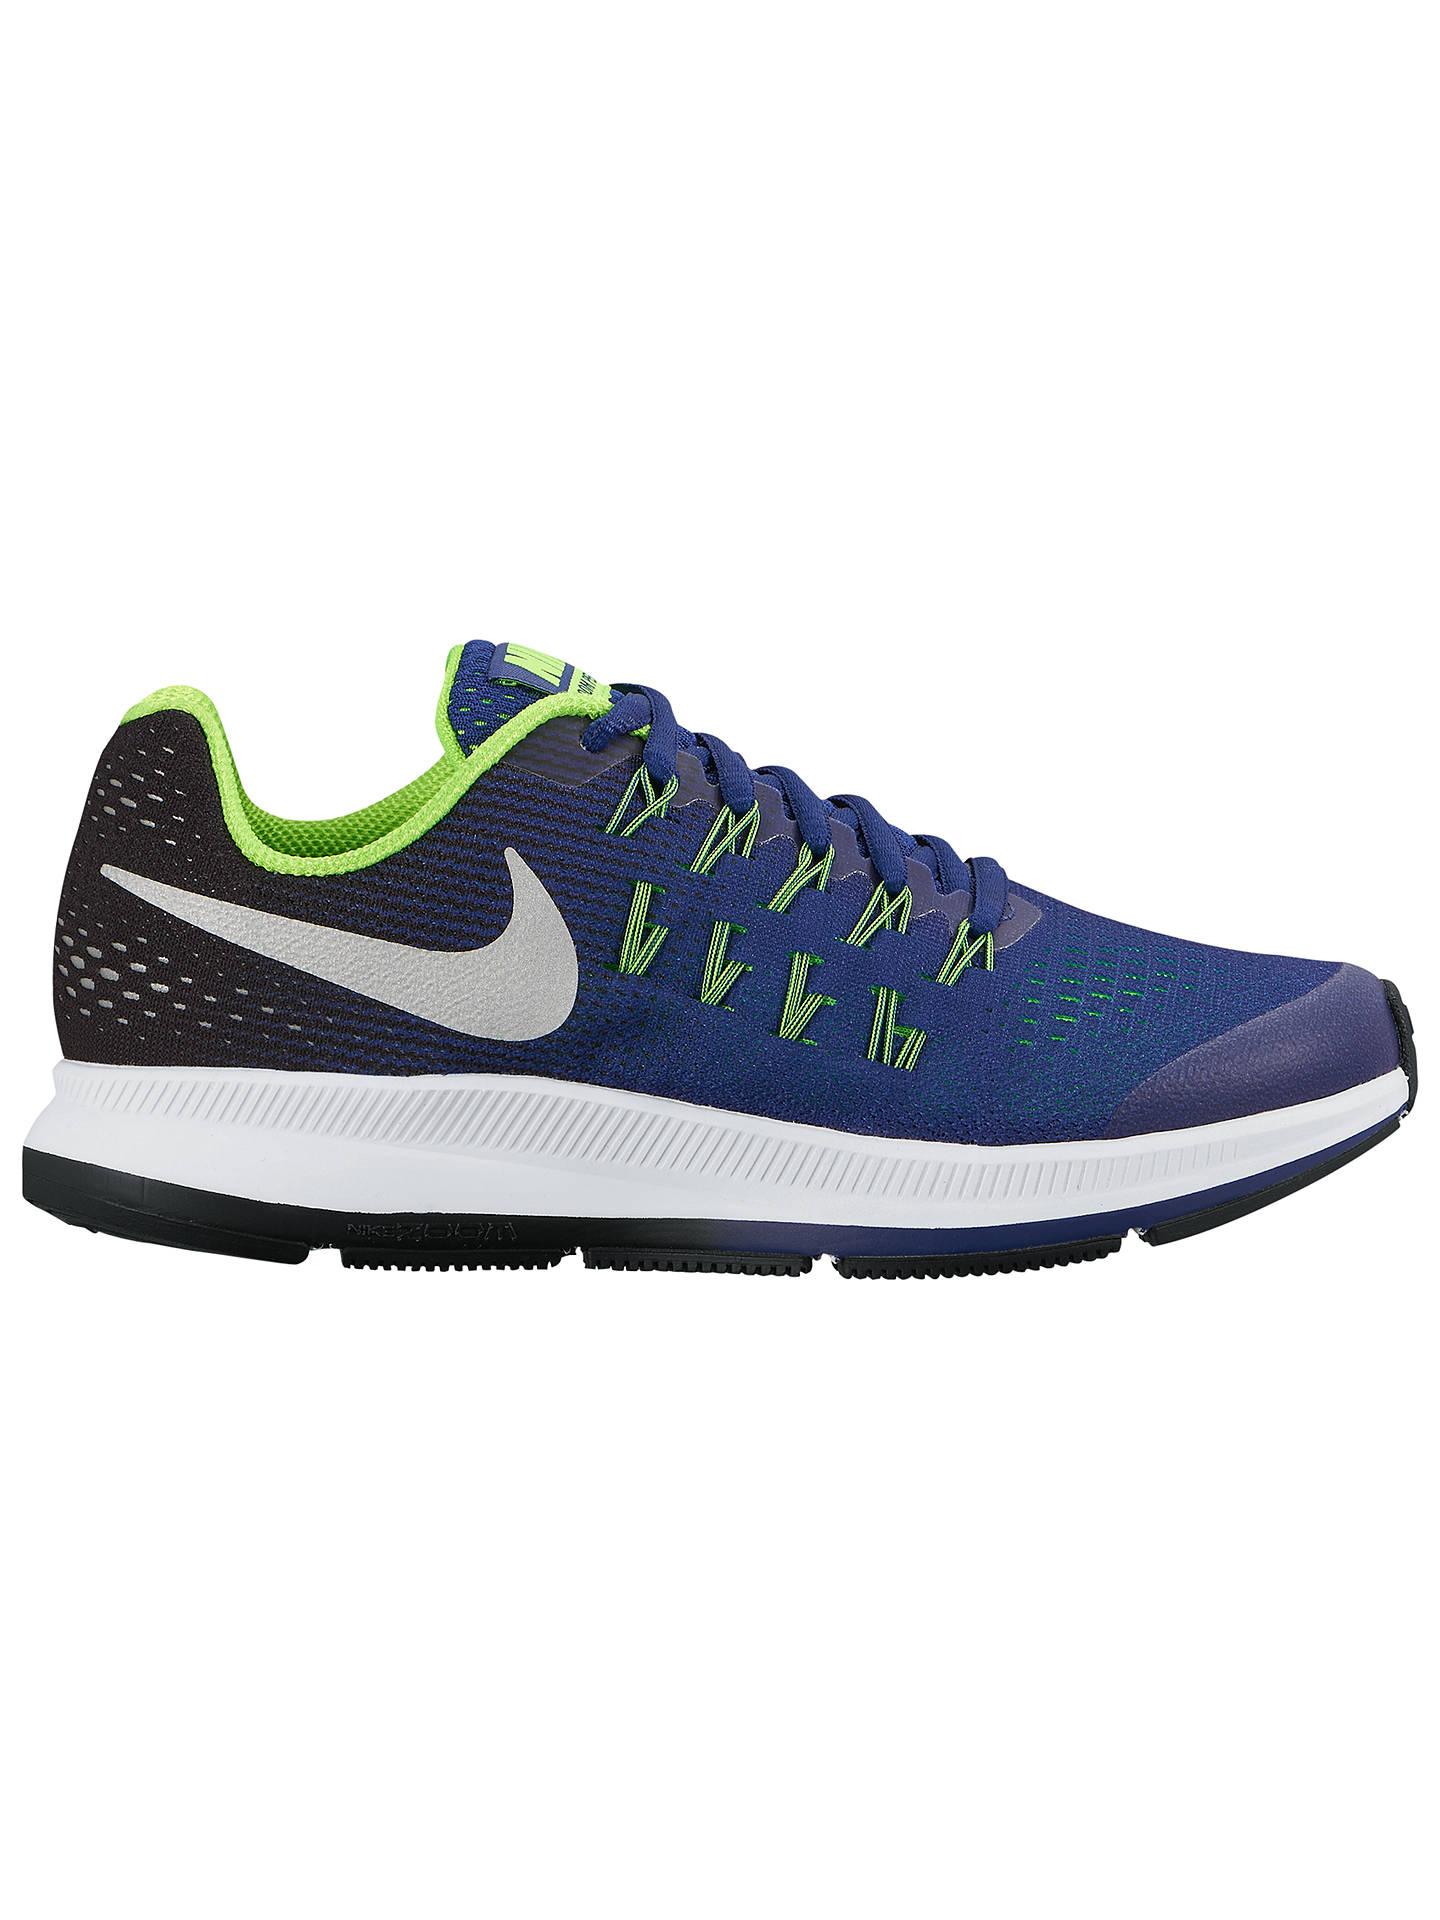 5c0fdfe2e36c8 Nike Children s Air Zoom Pegasus 33 Running Shoes at John Lewis ...